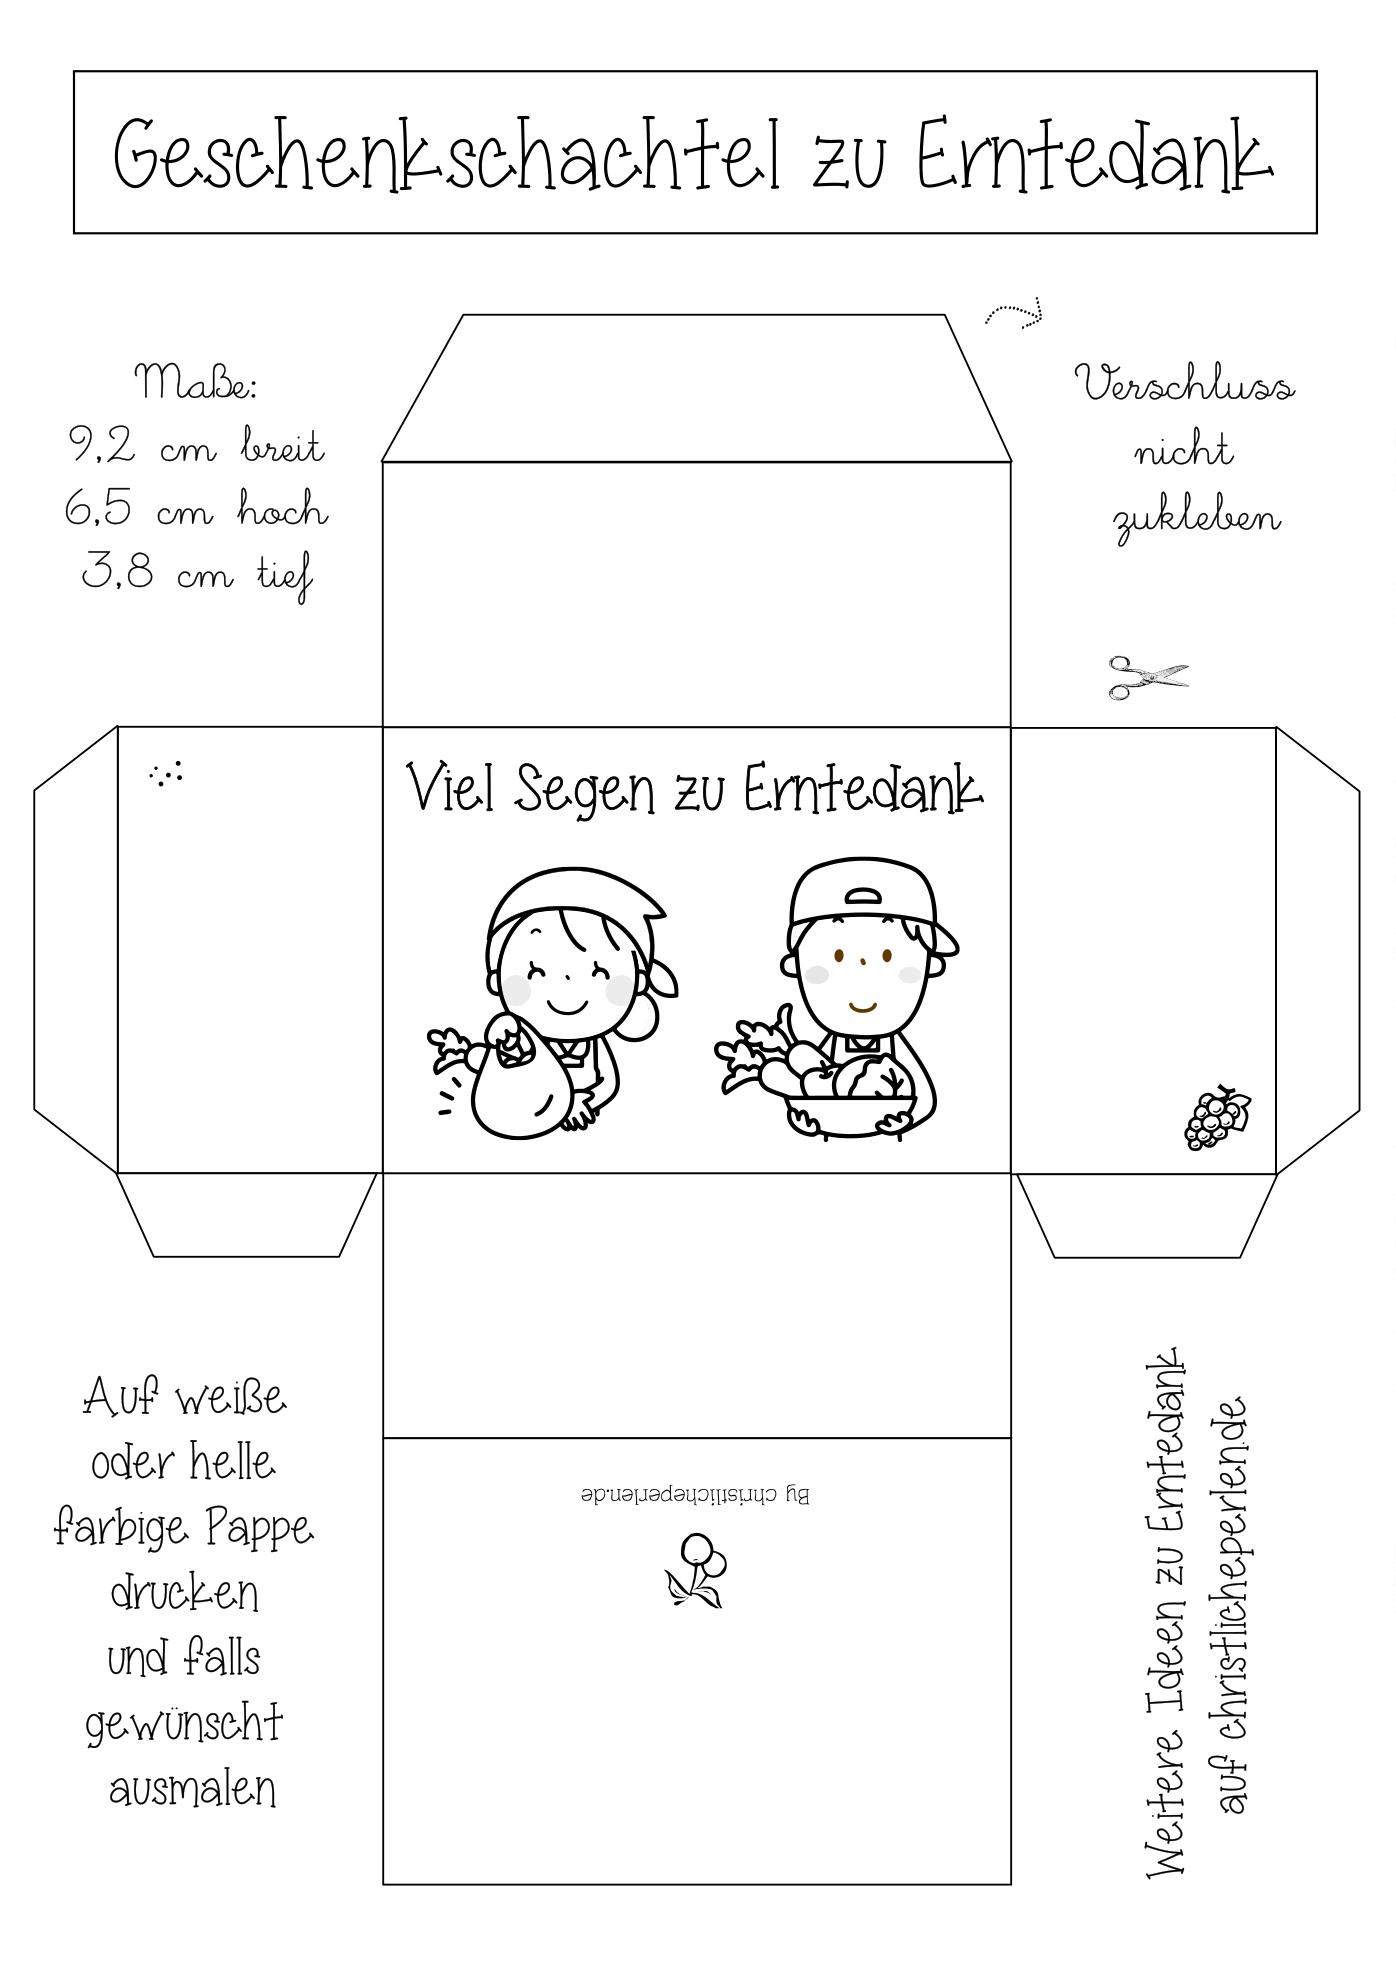 Erntedank Schachtel